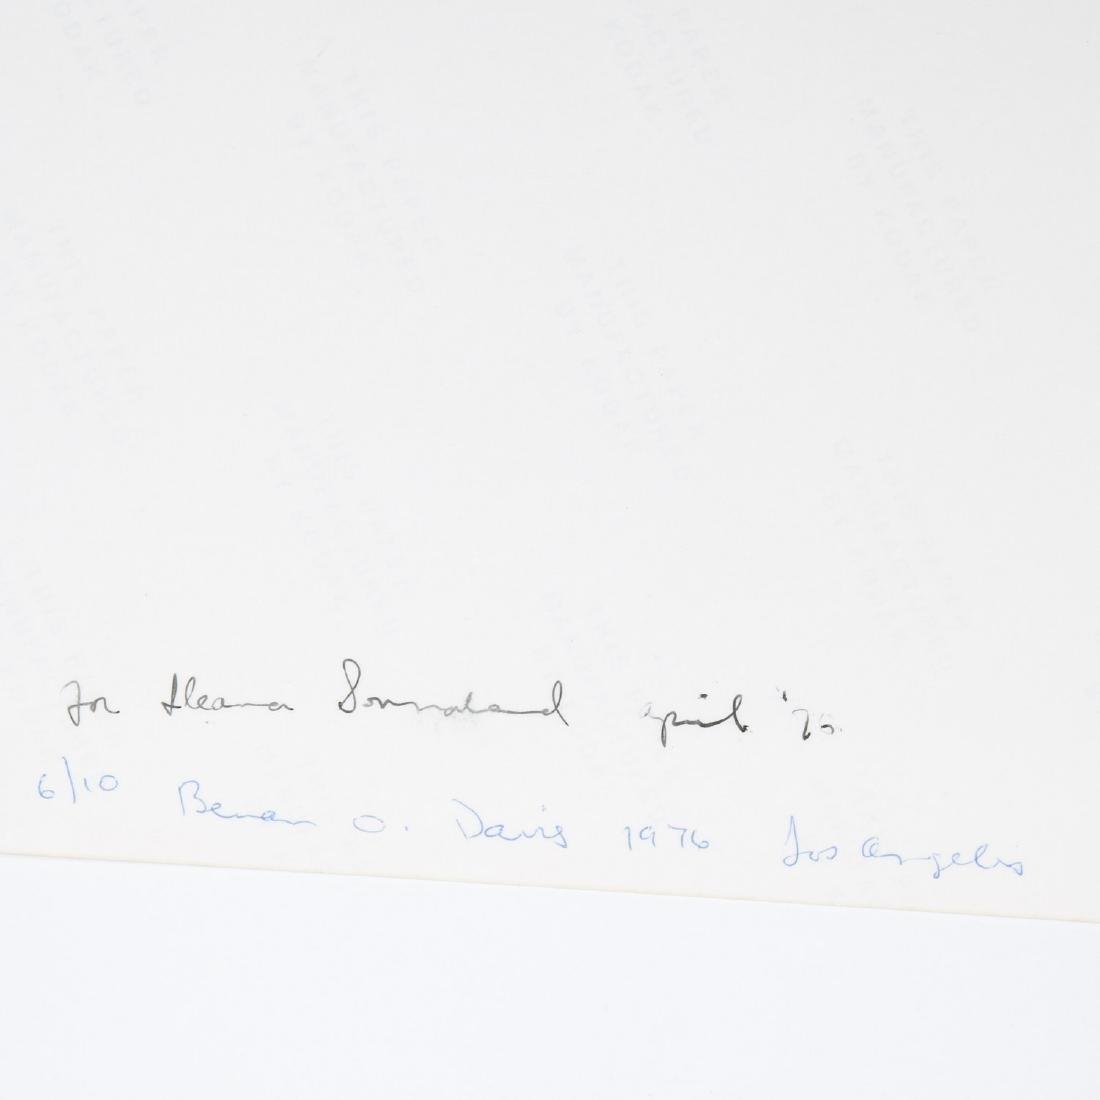 Bevan Davies, photograph - 6